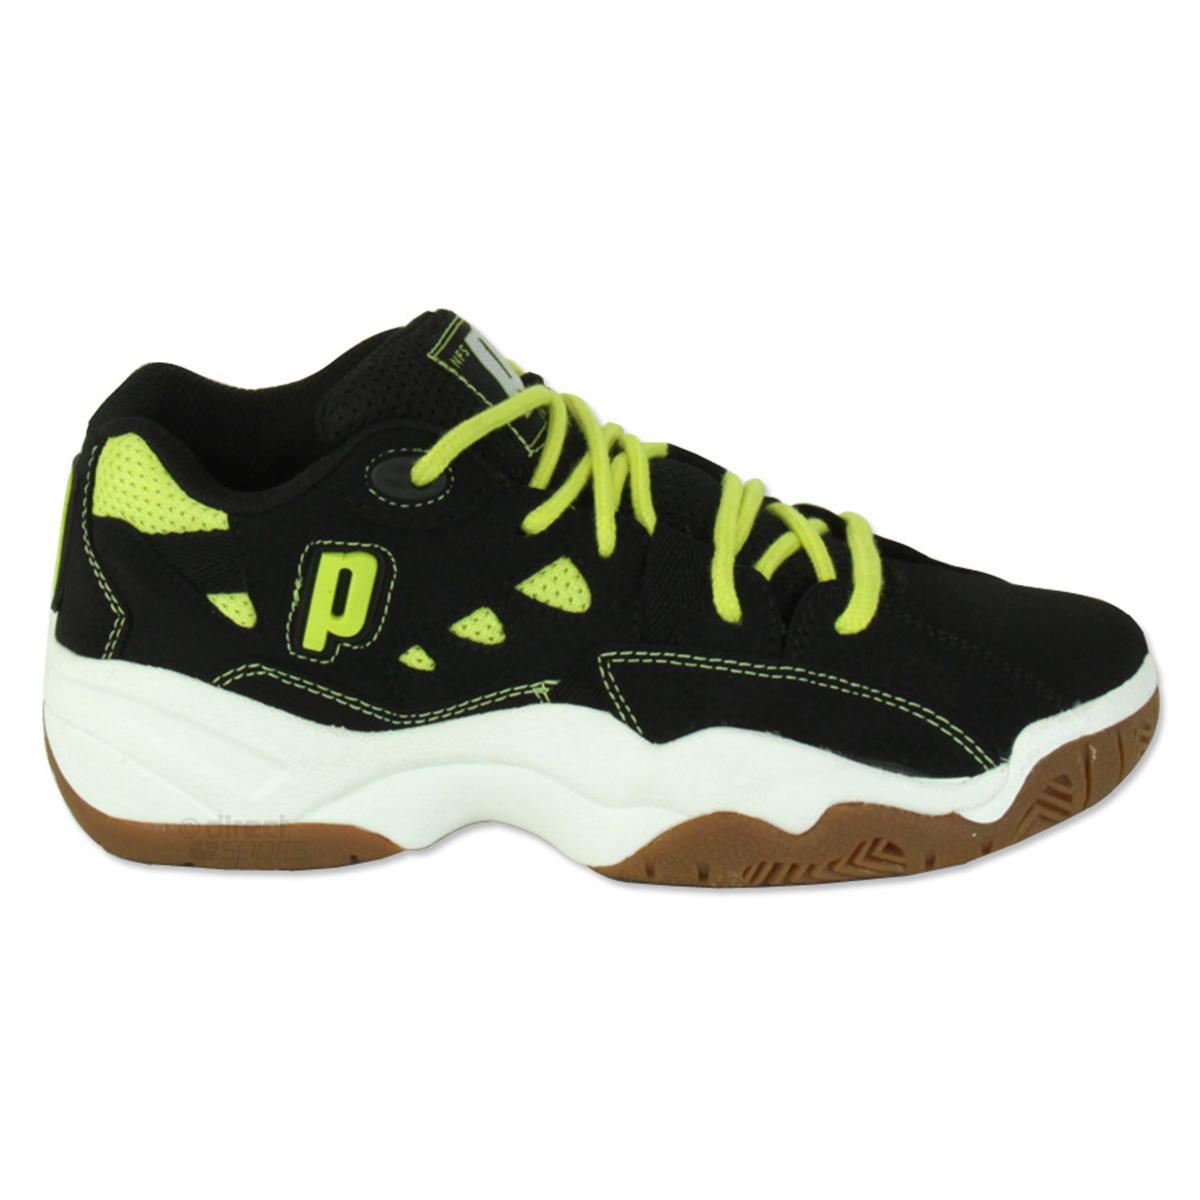 Prince Nfs Indoor Ii   Court Men S Shoes Black White